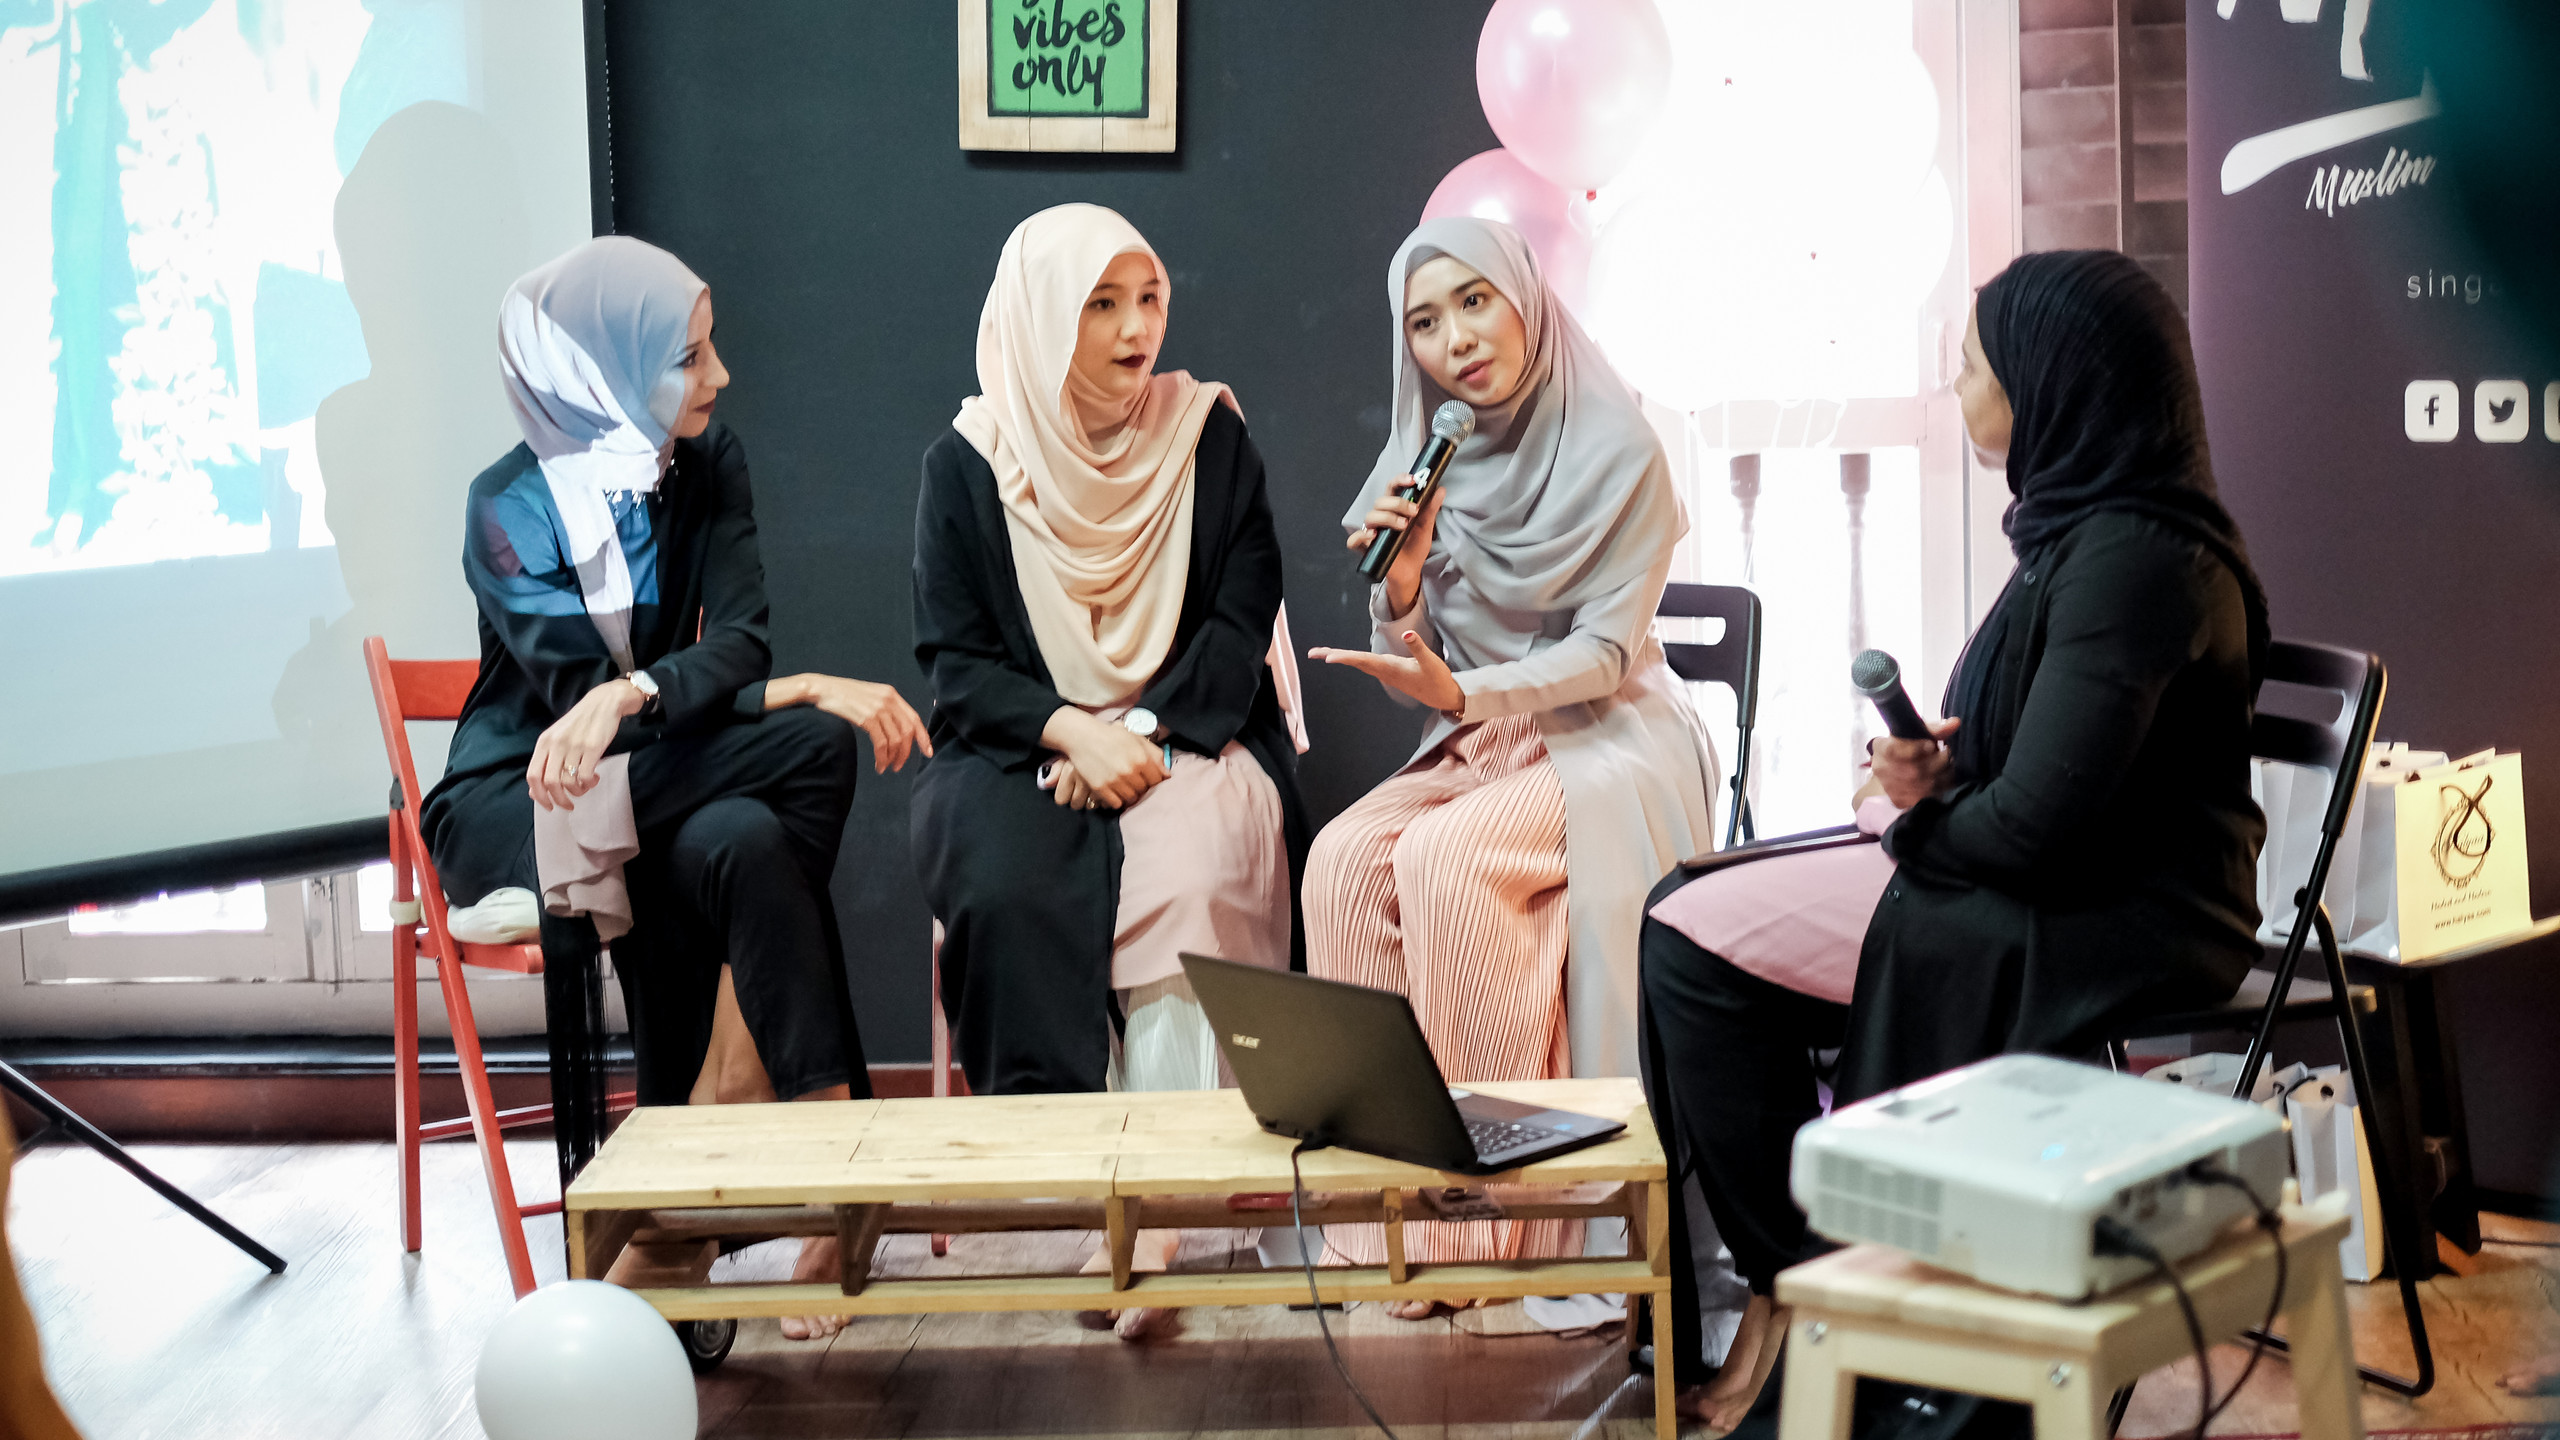 Left to right. Hasna B, modest fashion bloggers Zahra @zahraaaj, Nur Khairunnia @uhnisa, Tayeba